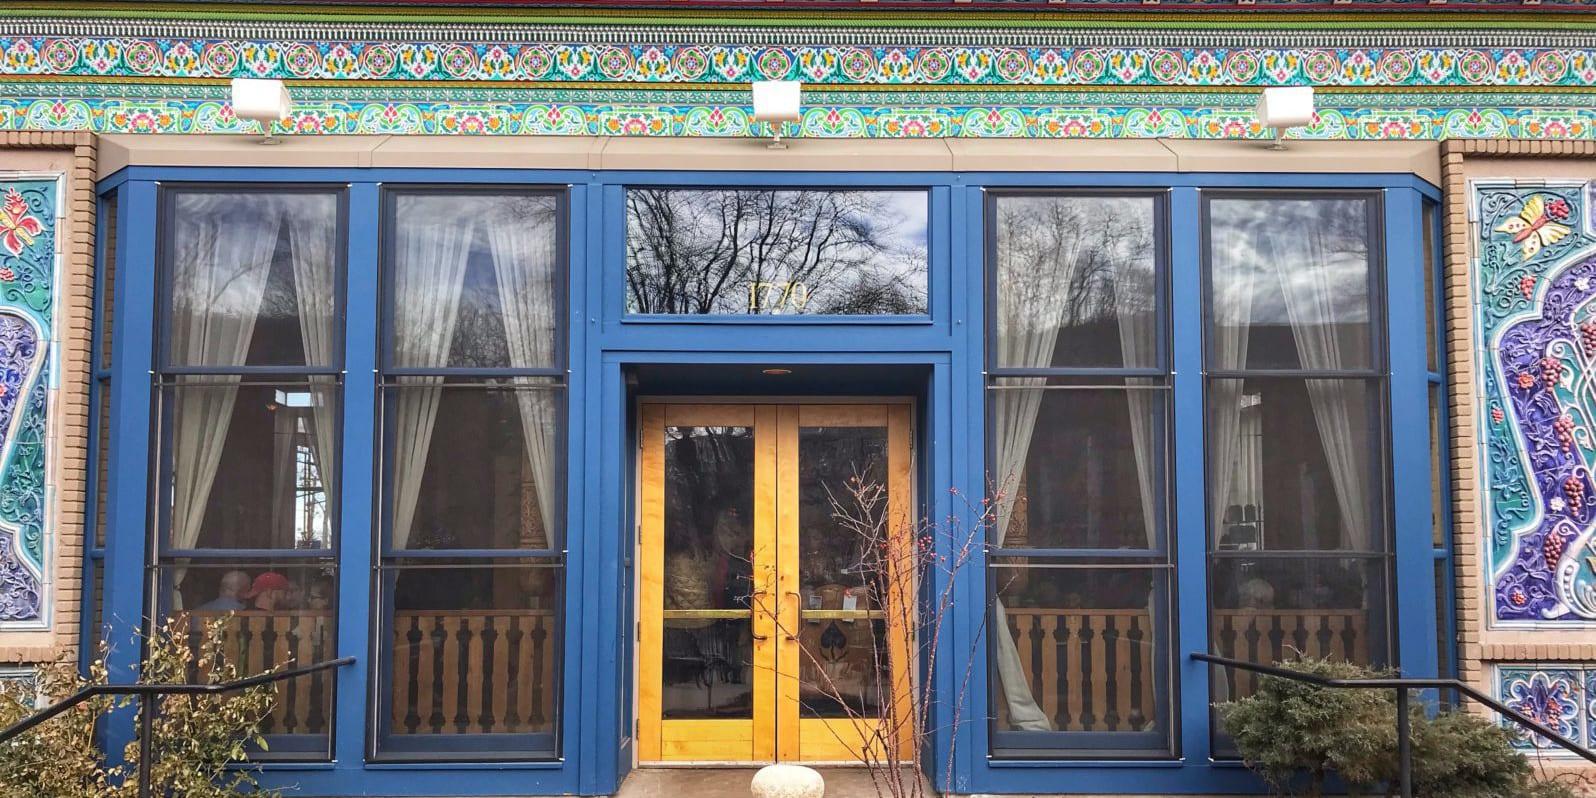 Boulder Dushanbe Teahouse Colorado Exterior